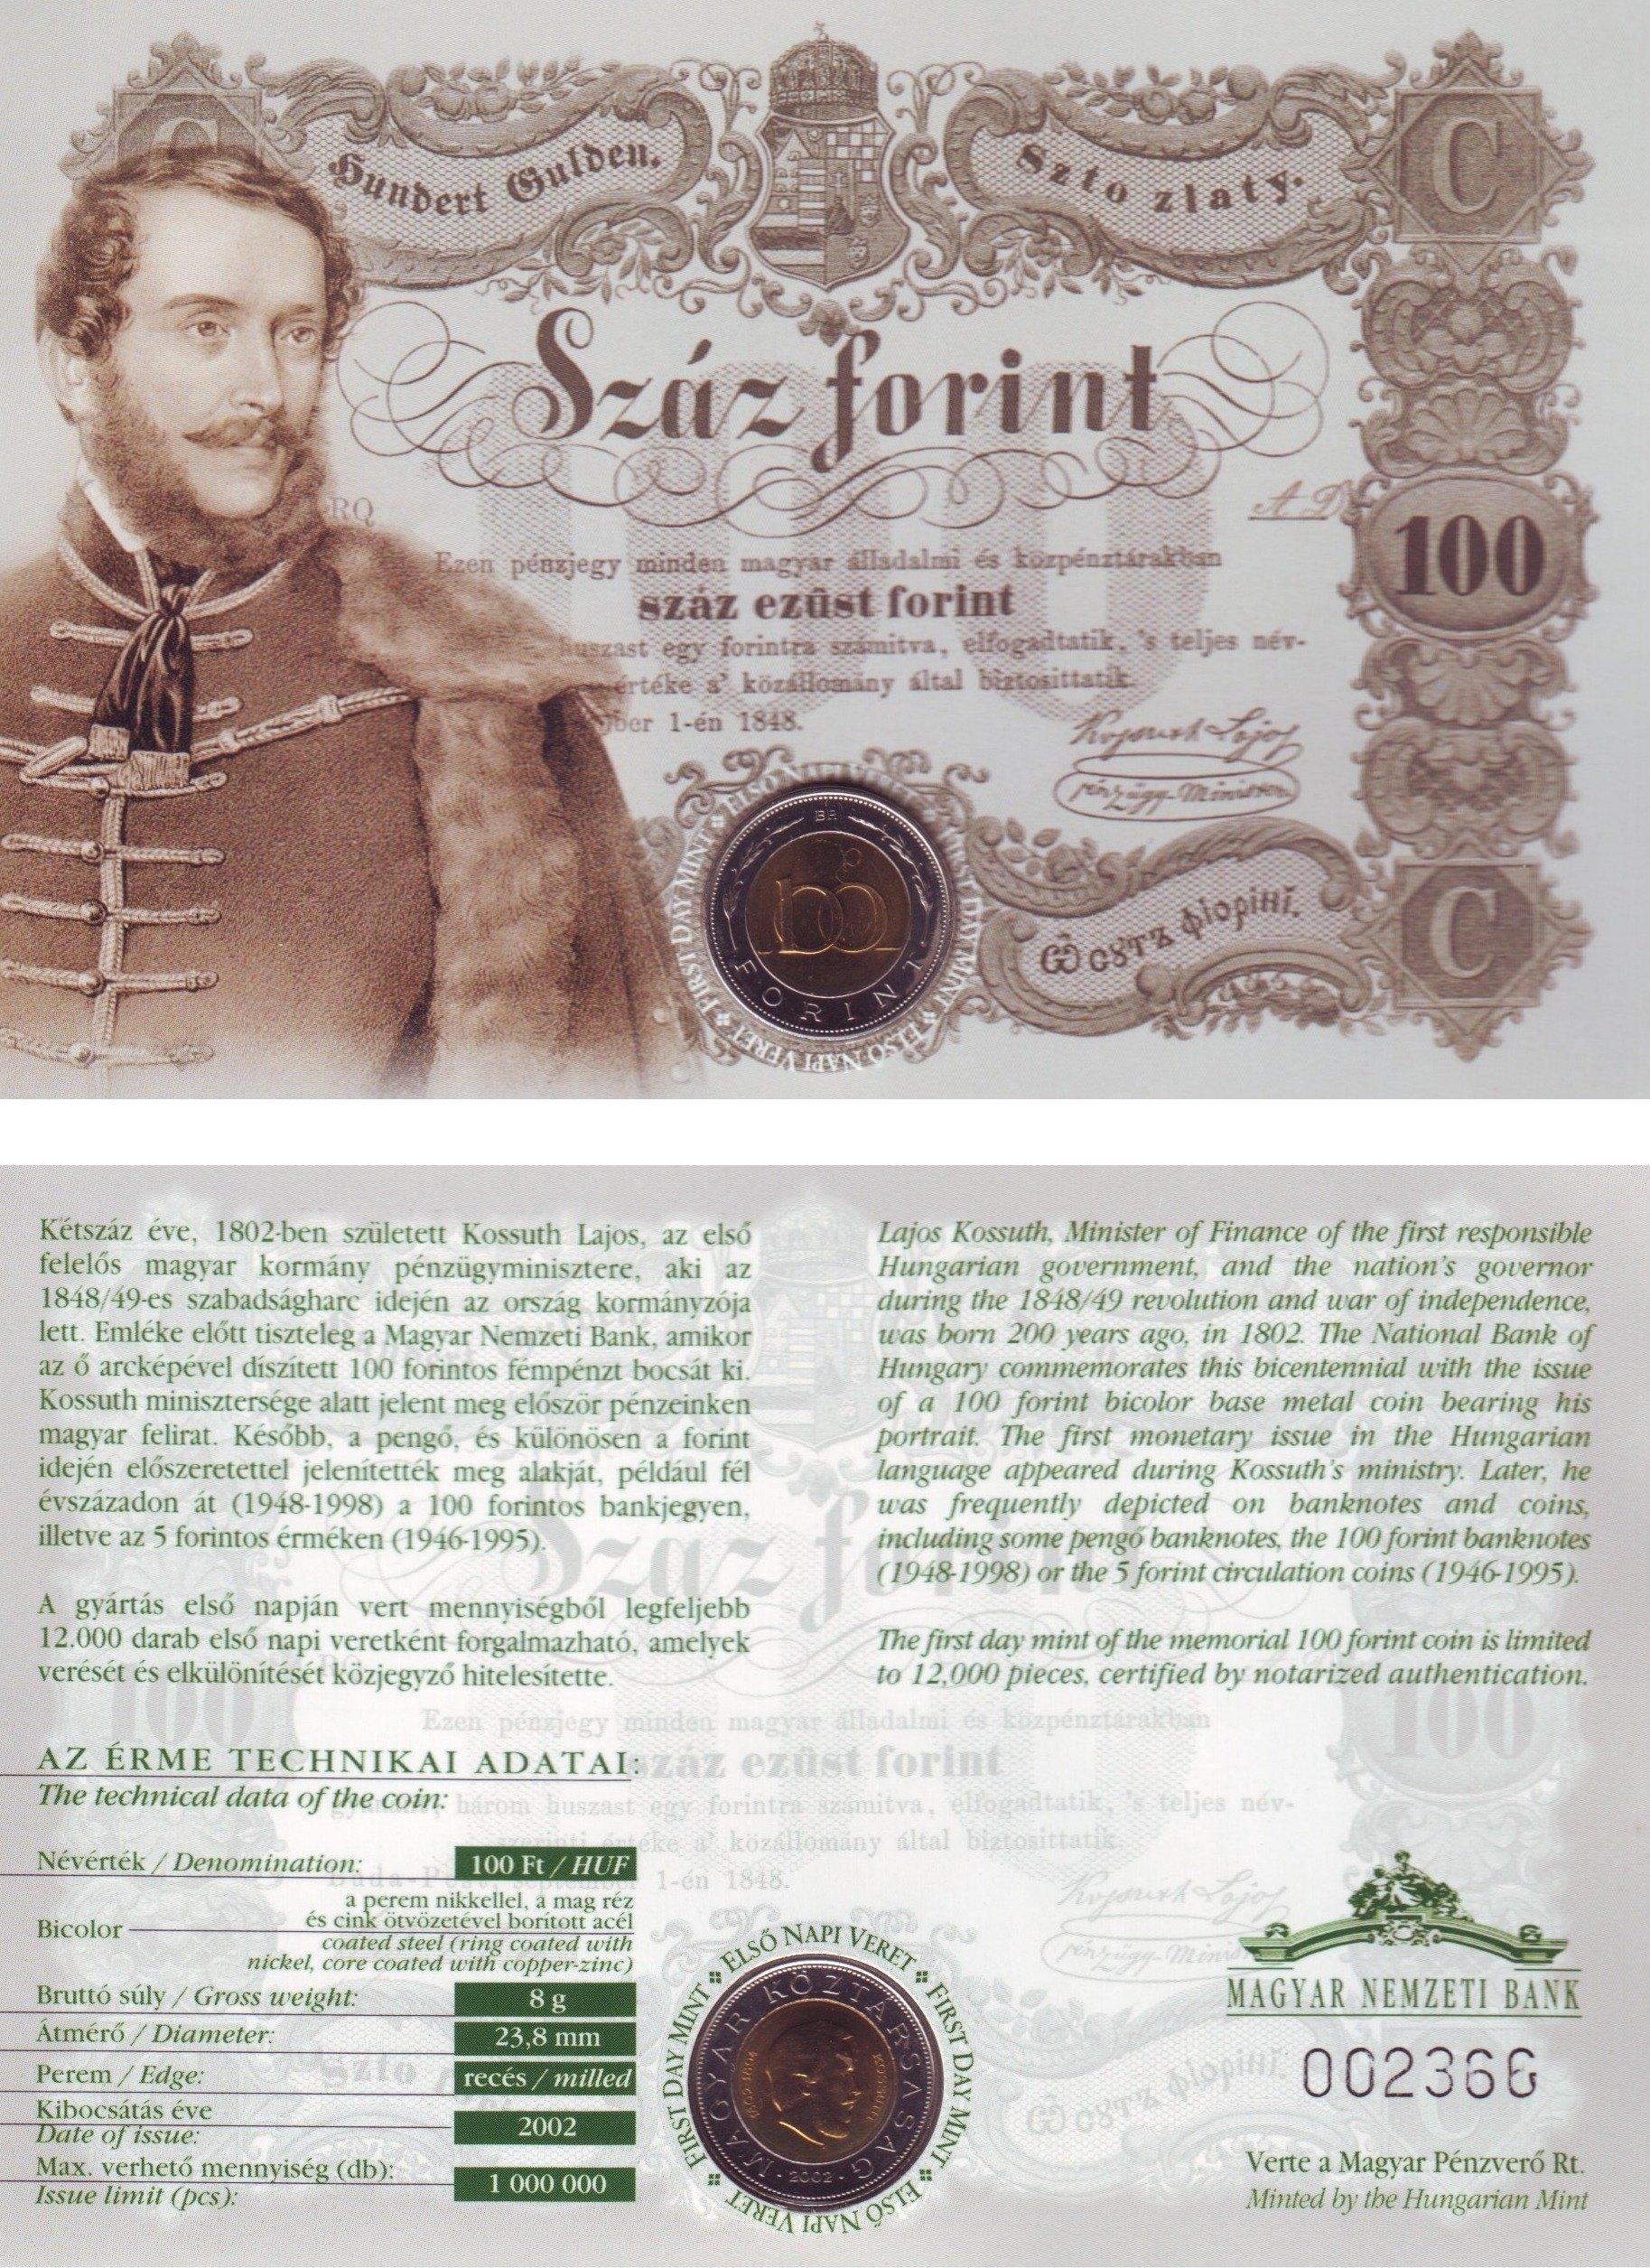 http://www.hamispenzek.hu/hamis-csomagolasok/www_forintportal_hu_100ft_kossuth_elsonapi_nagy.jpg